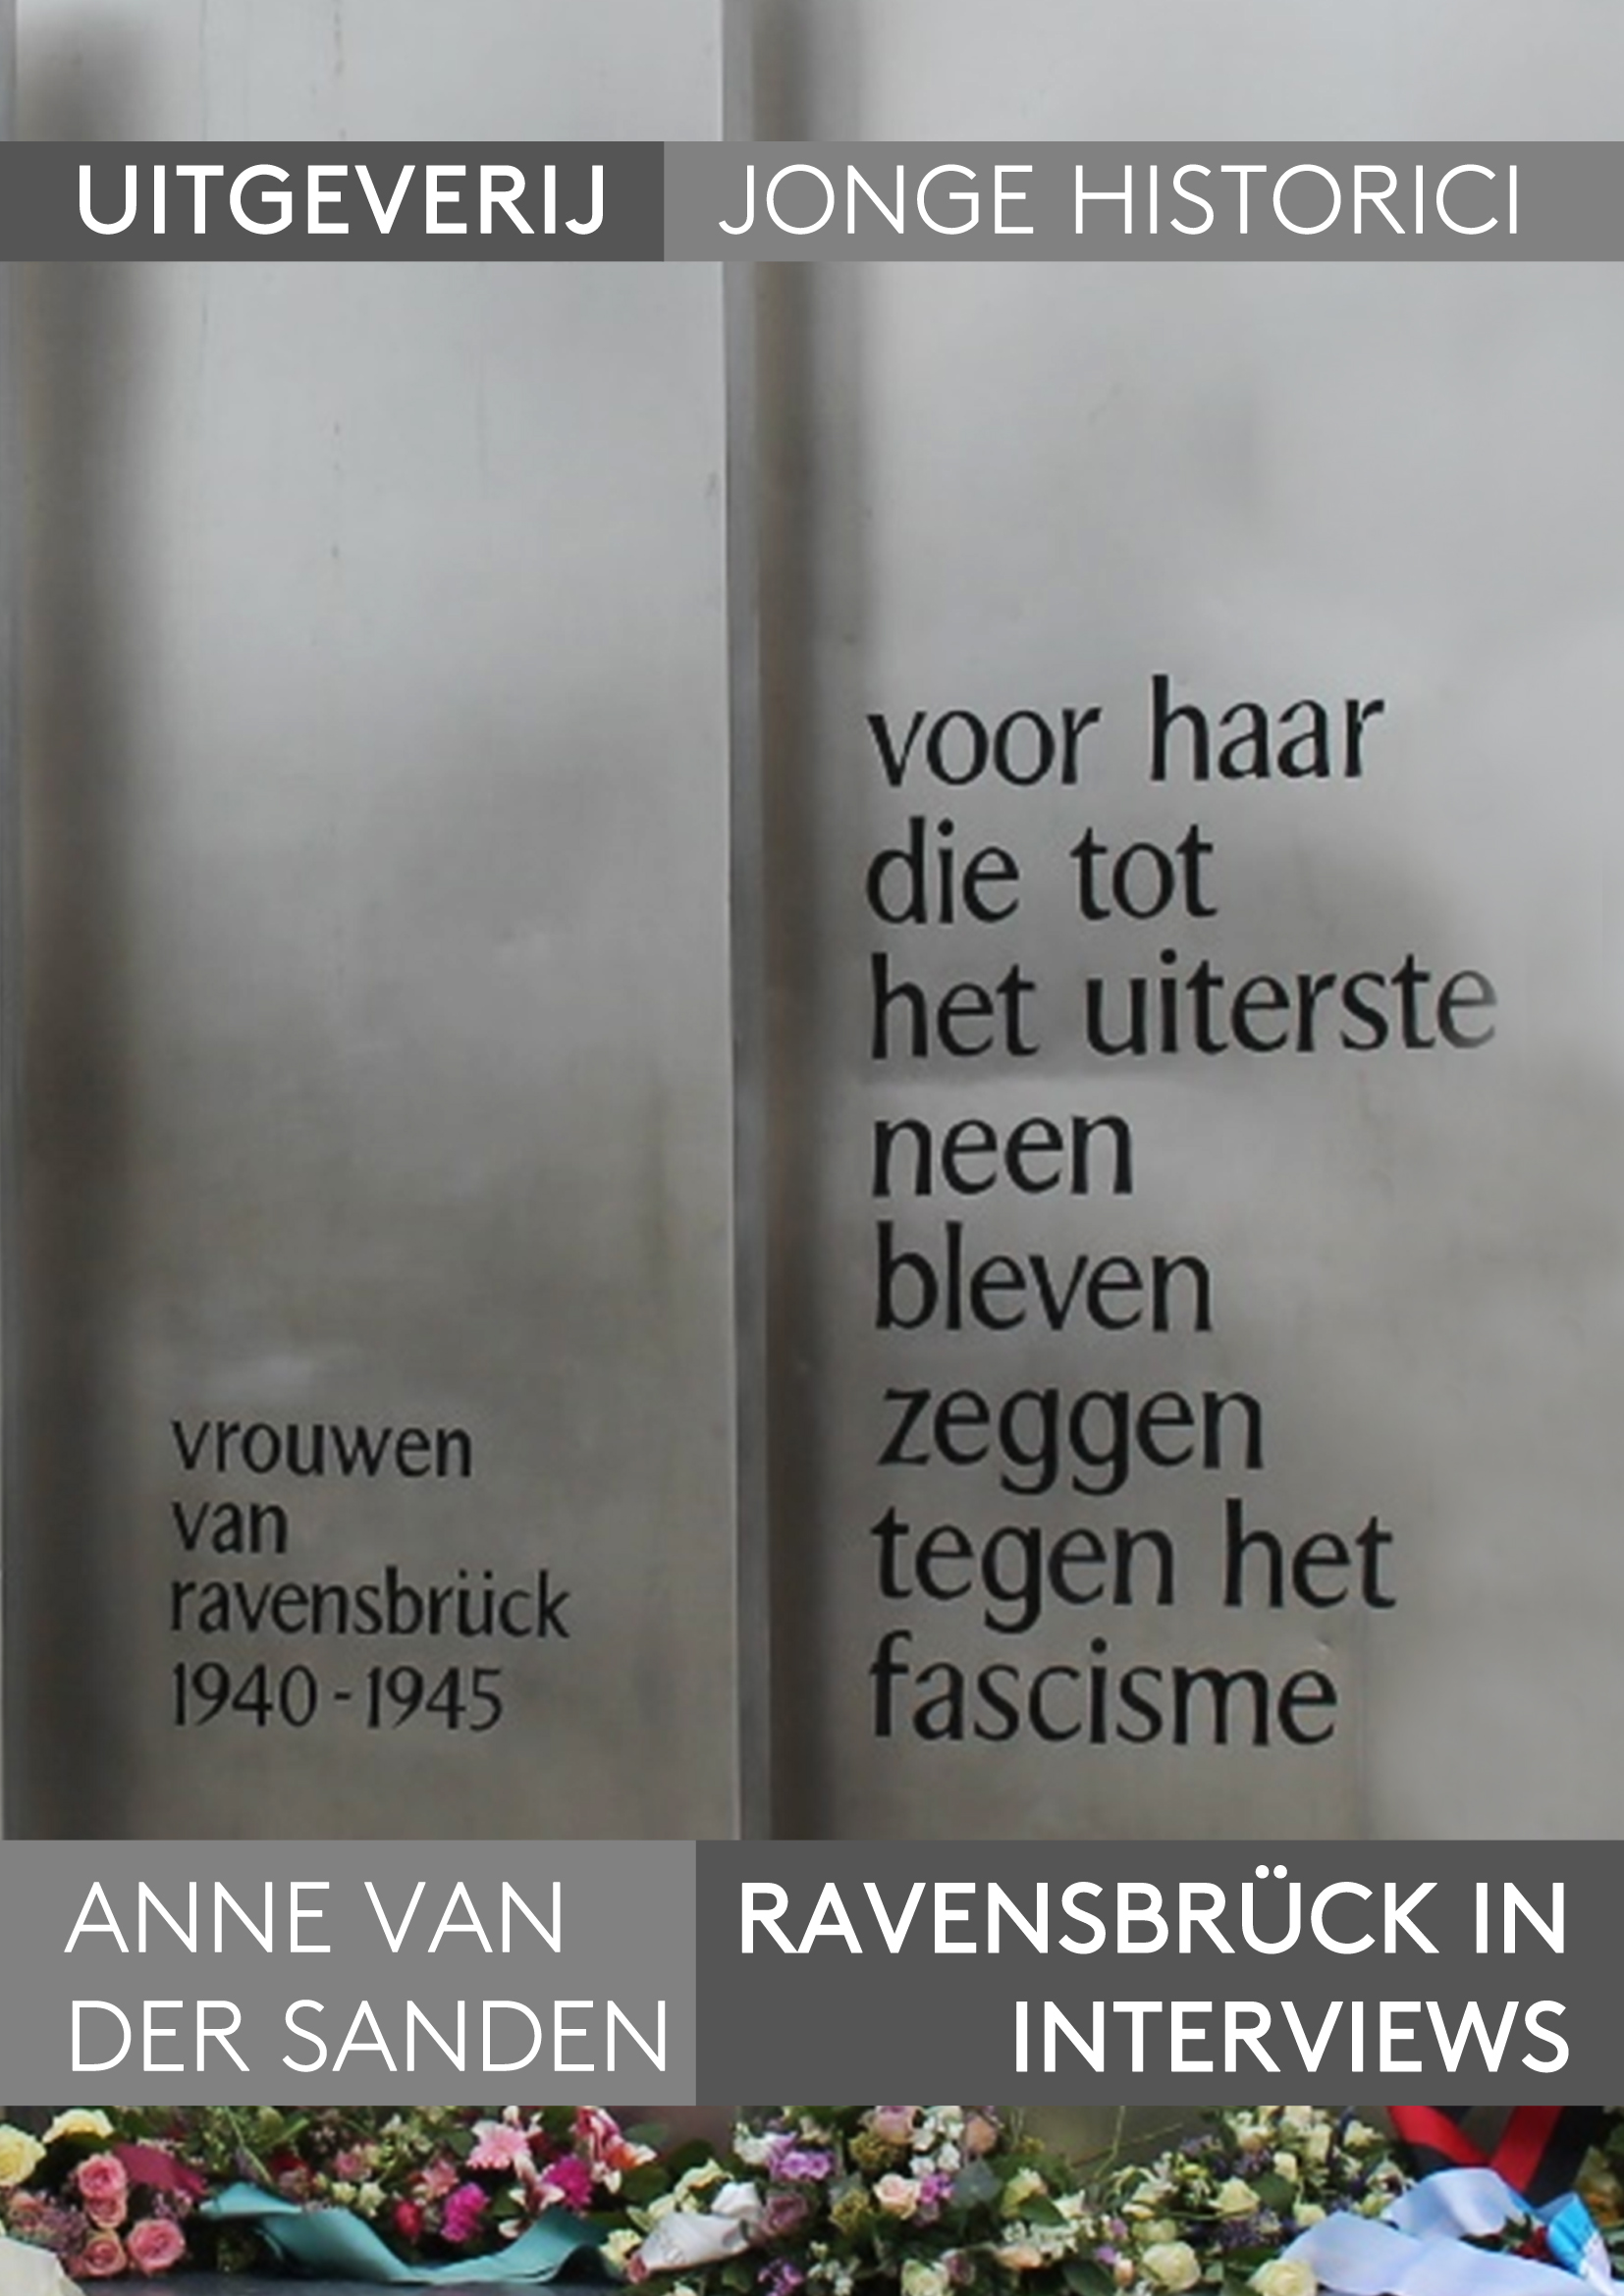 Anne van der Sanden, Ravensbrück in interviews. Beelden van concentratiekamp Ravensbrück tussen 1939 en 1945